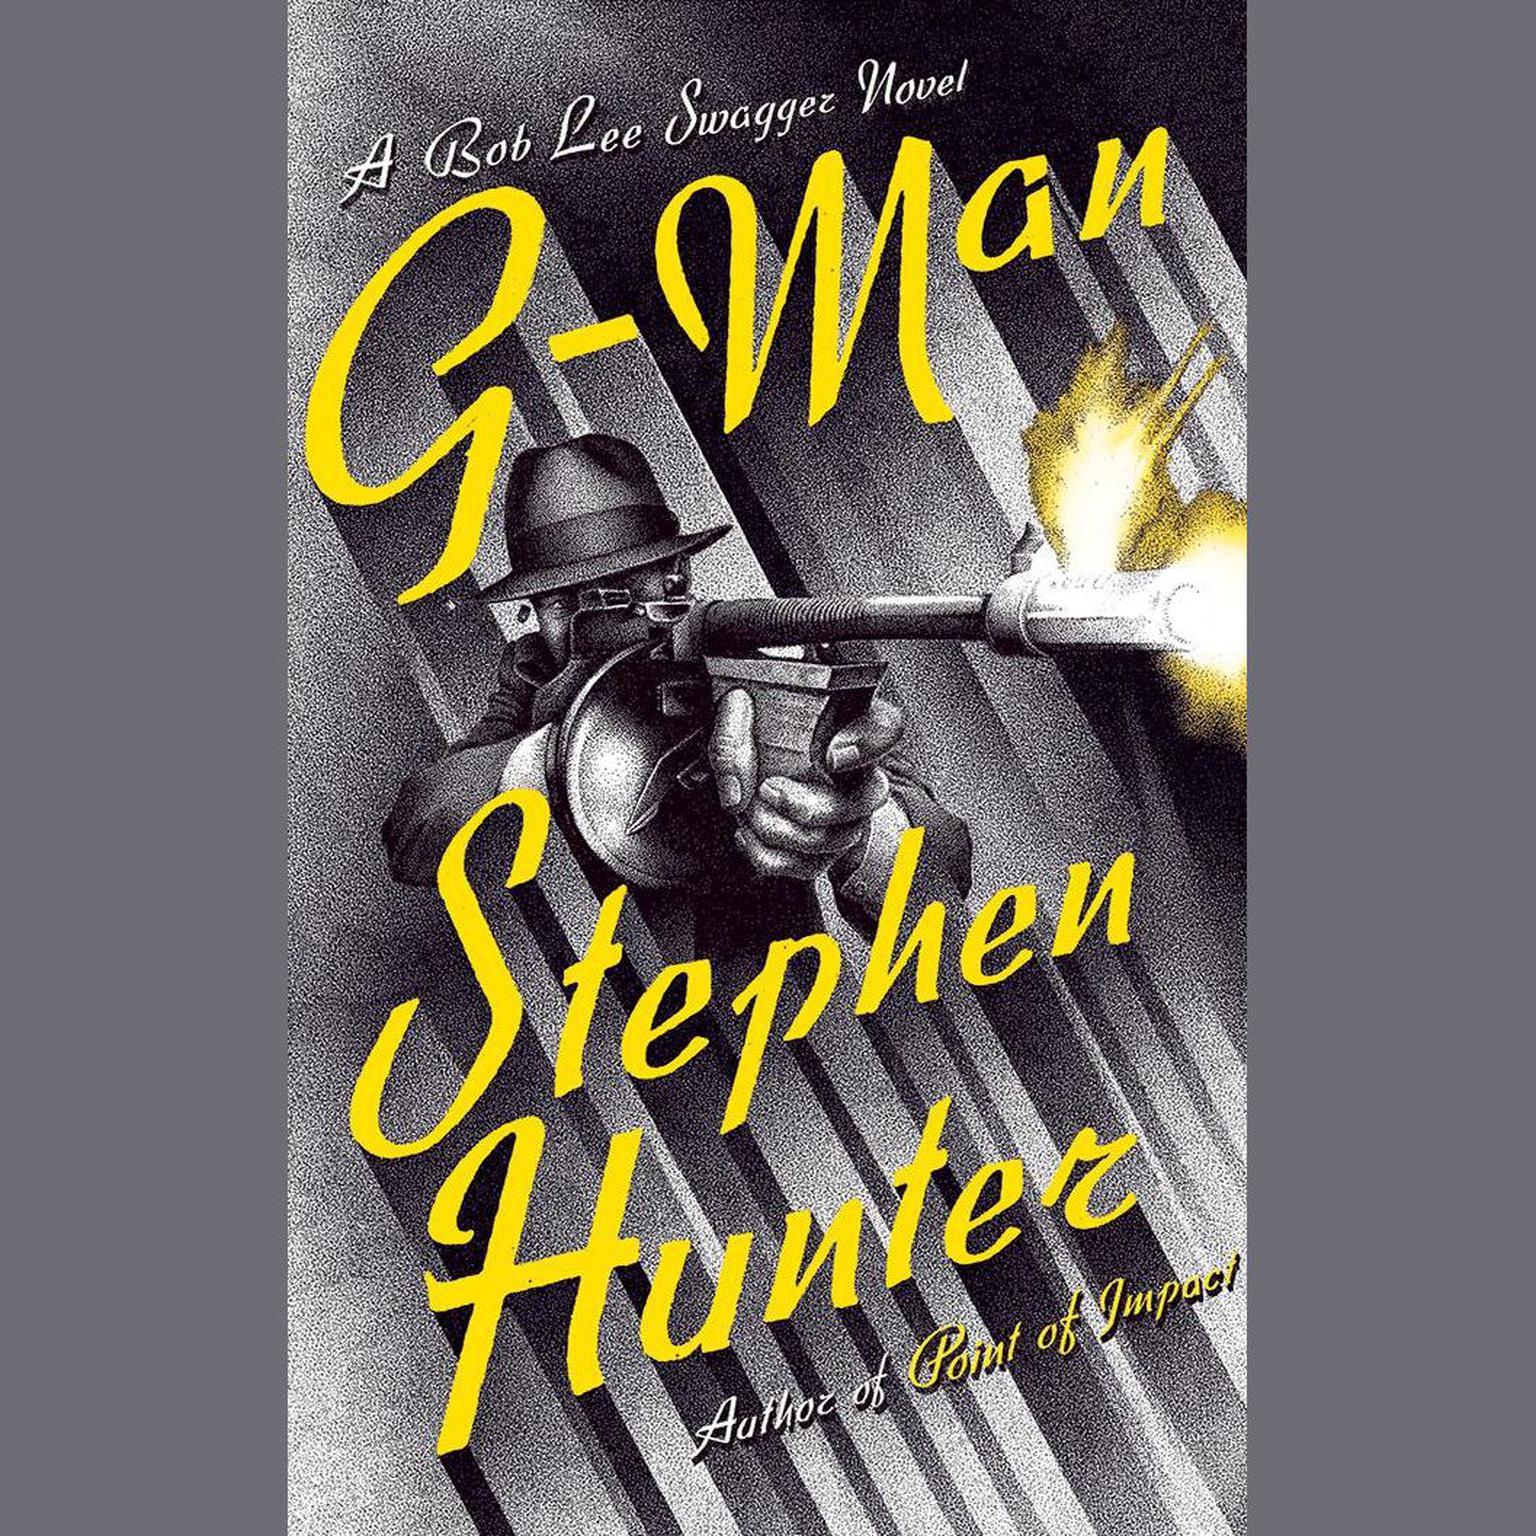 Printable G-Man: A Bob Lee Swagger Novel Audiobook Cover Art